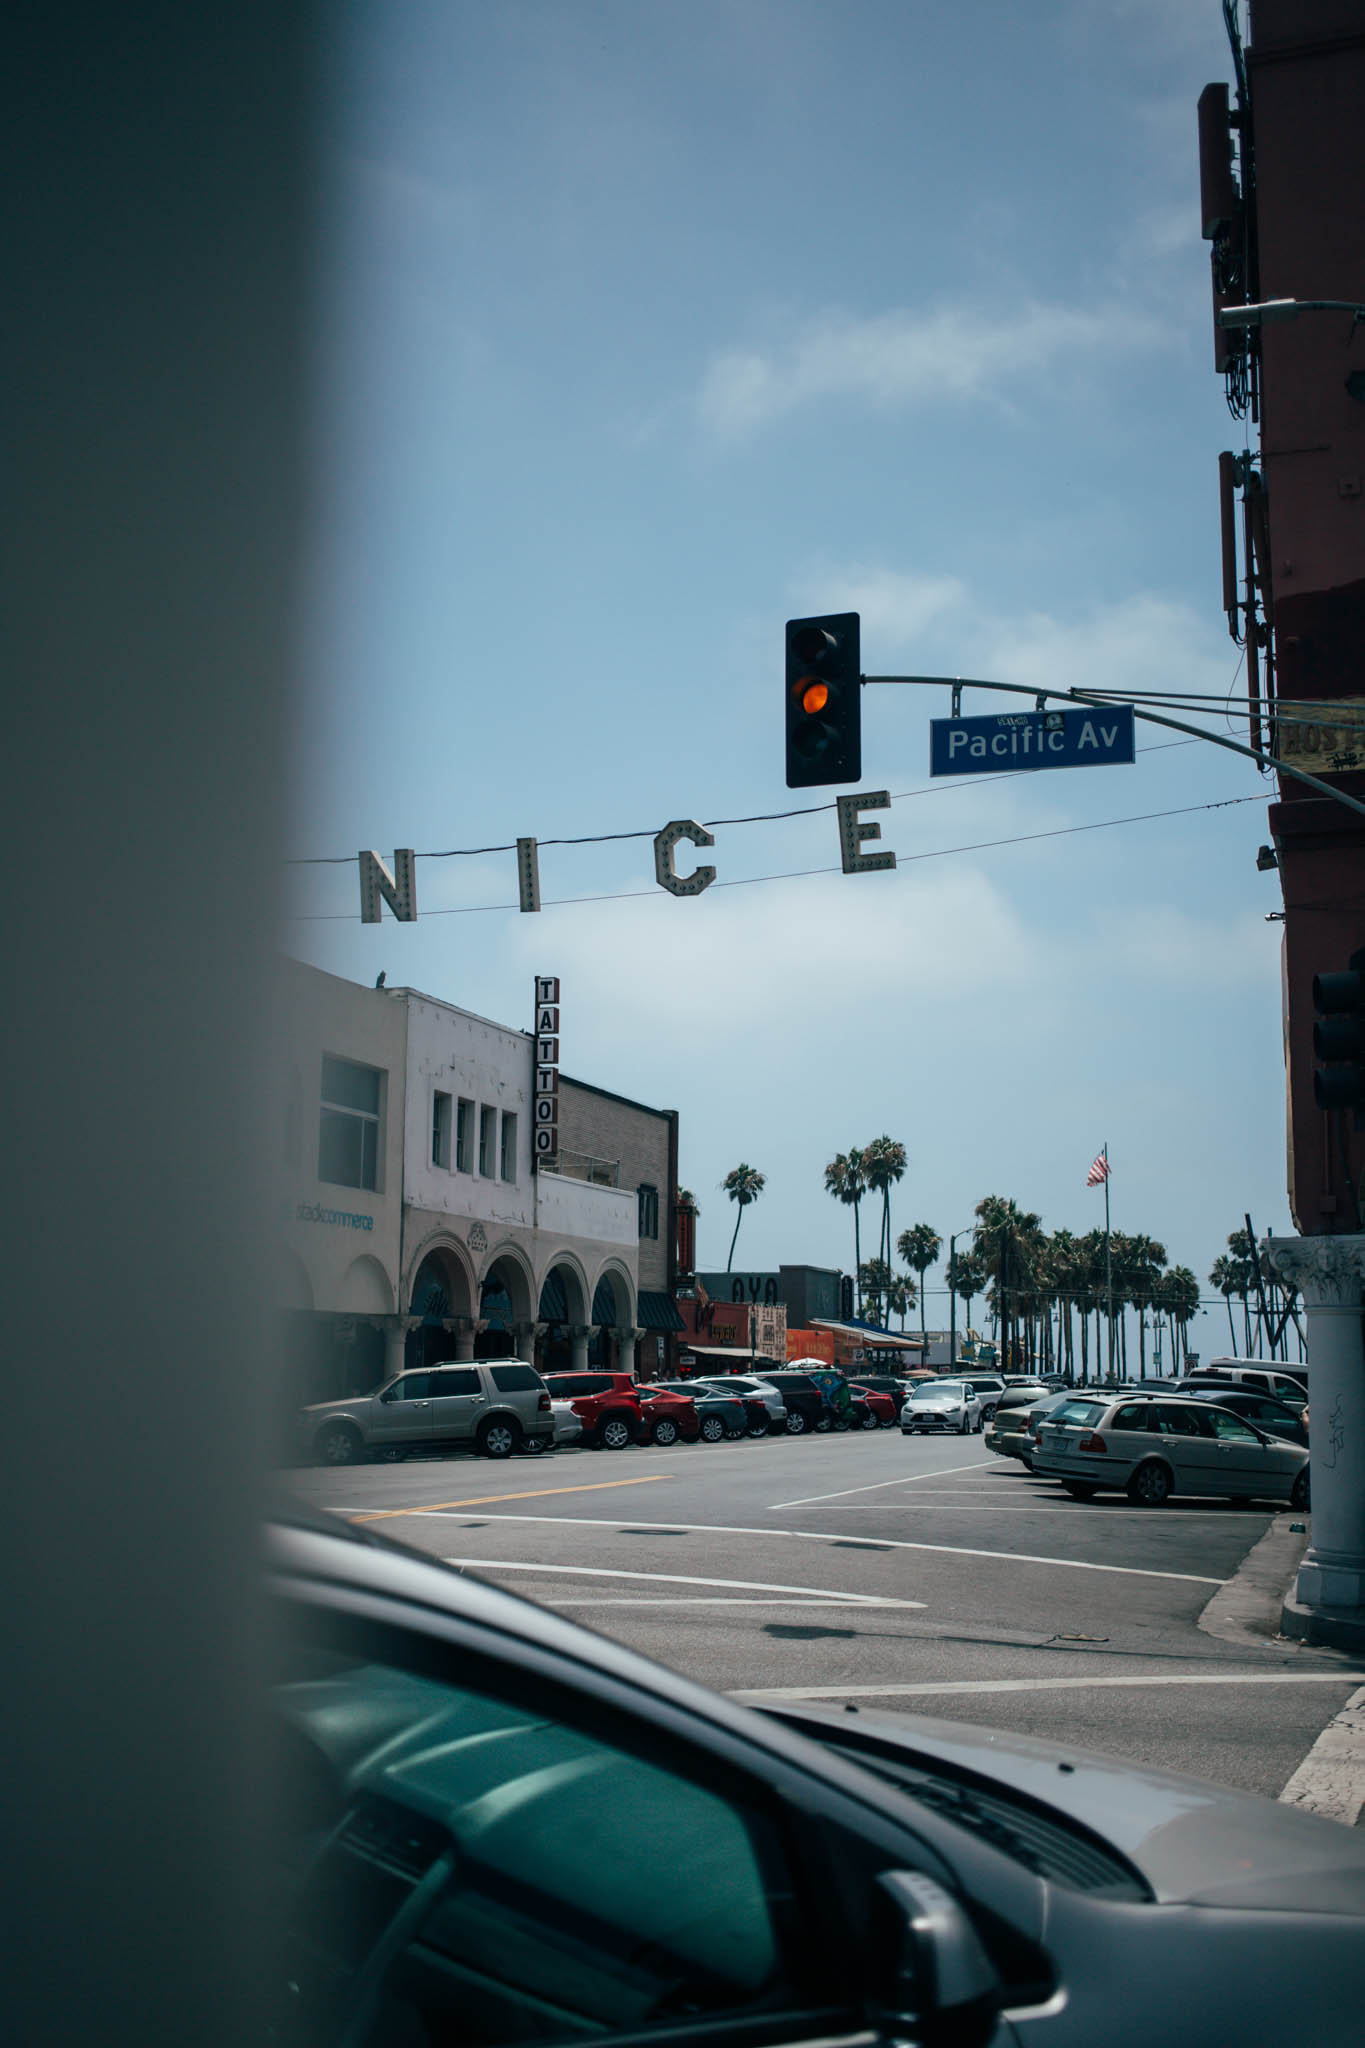 Stay_Driven_Venice-2.jpg